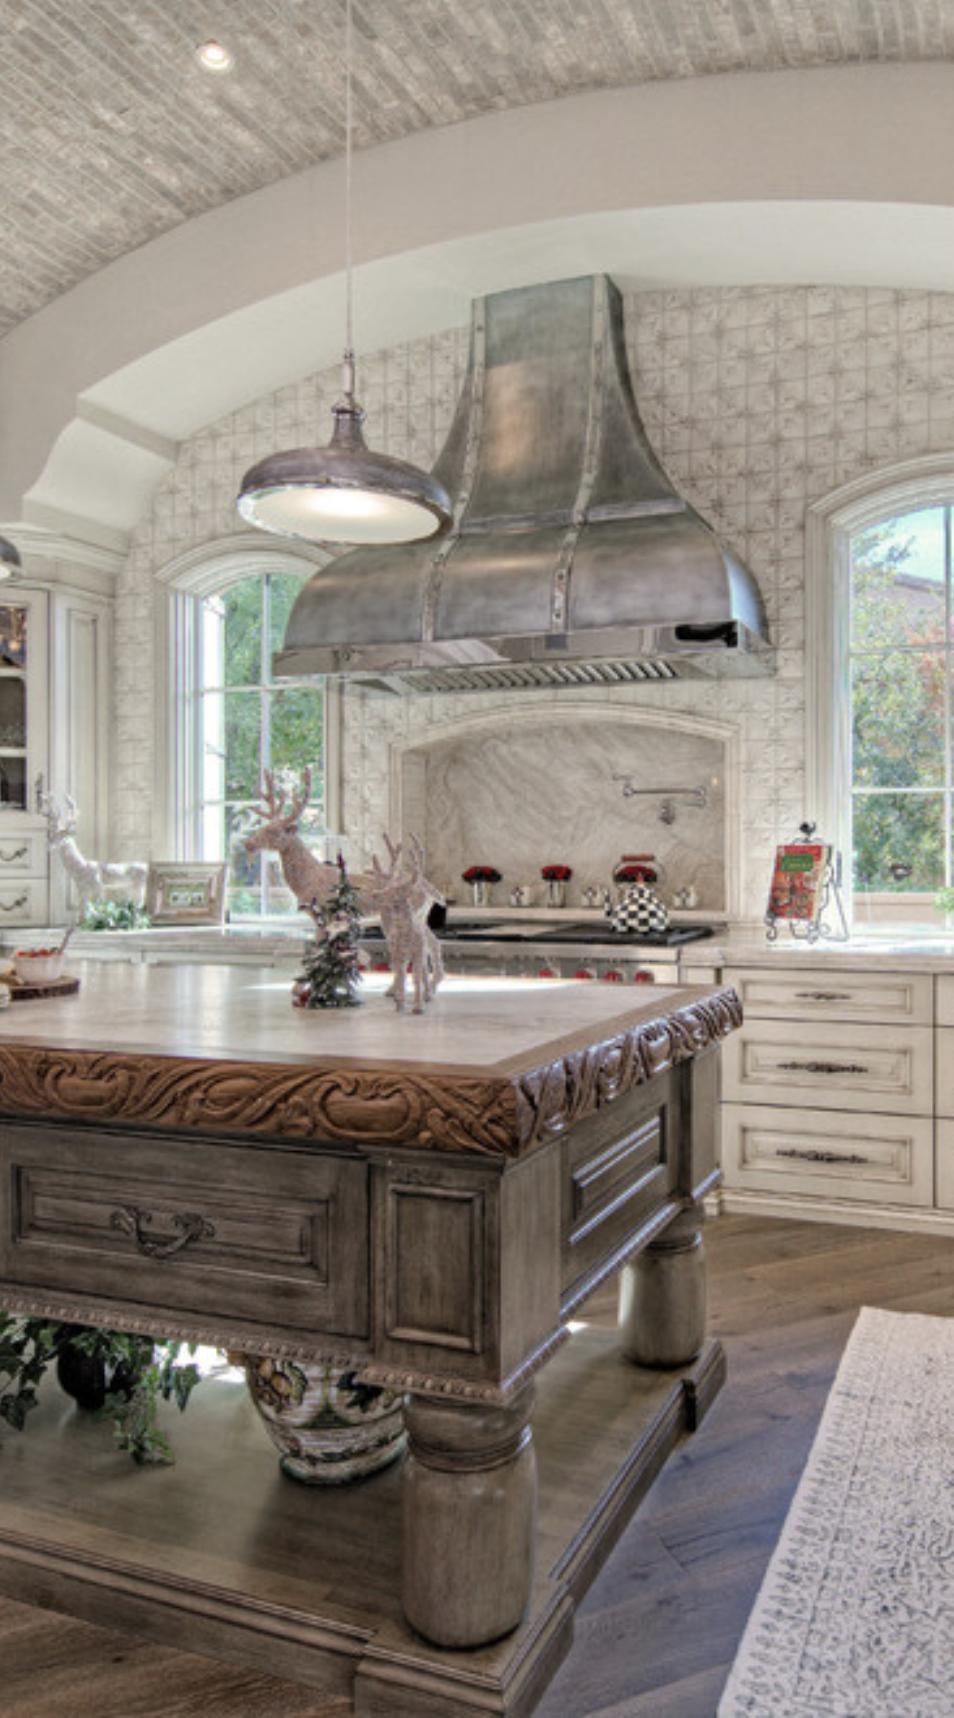 OLD World Kitchen. White. Urban. Rustic. | house | Pinterest ...